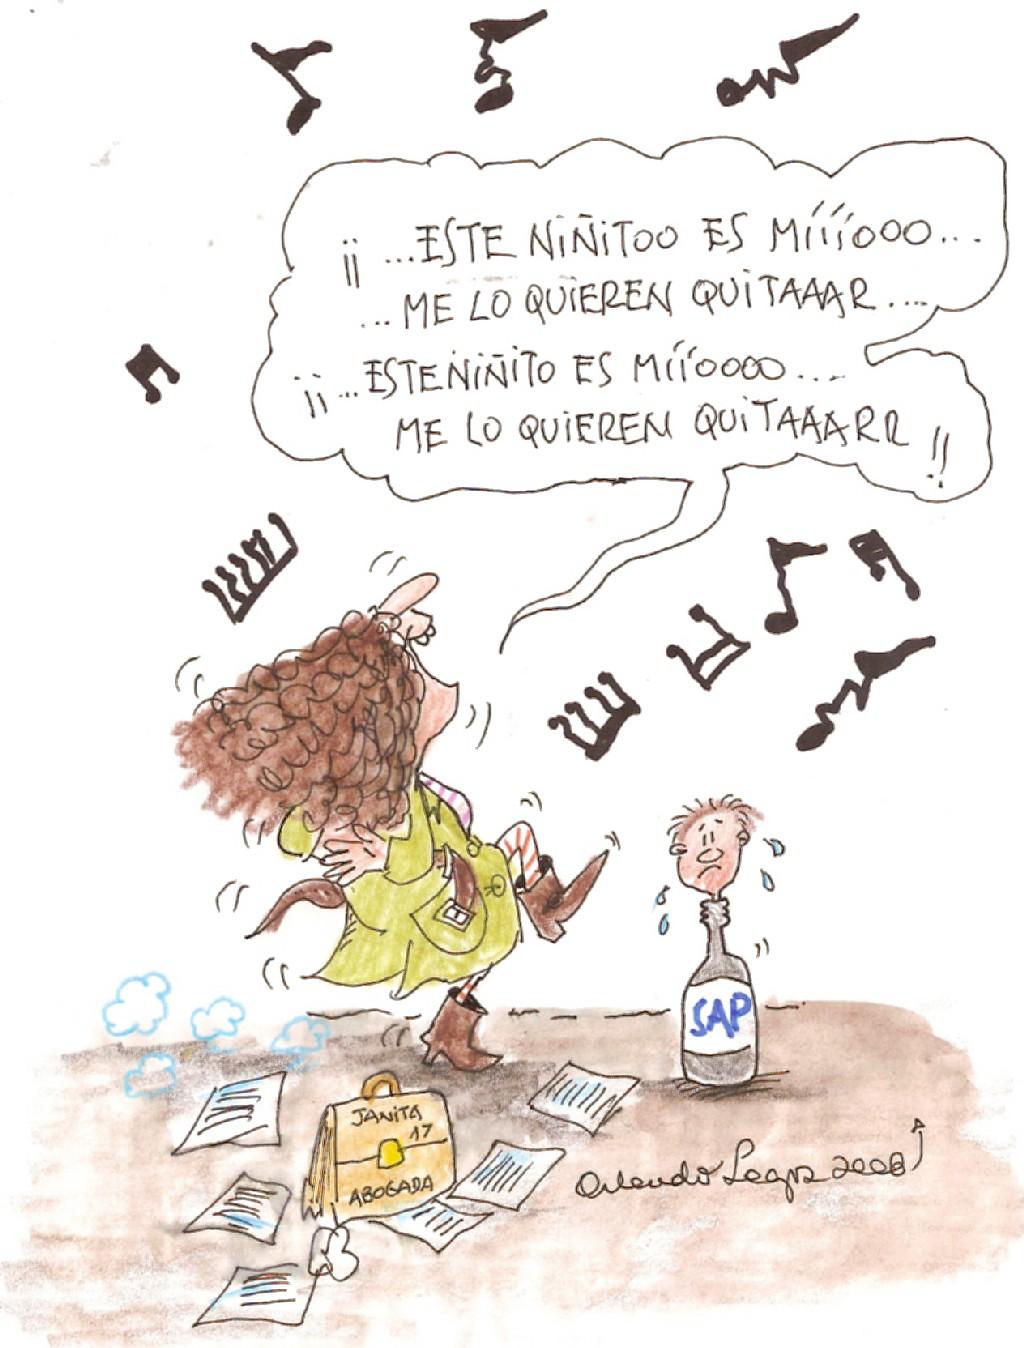 2008-03-25_Janita_Este_Ninito_es_mio